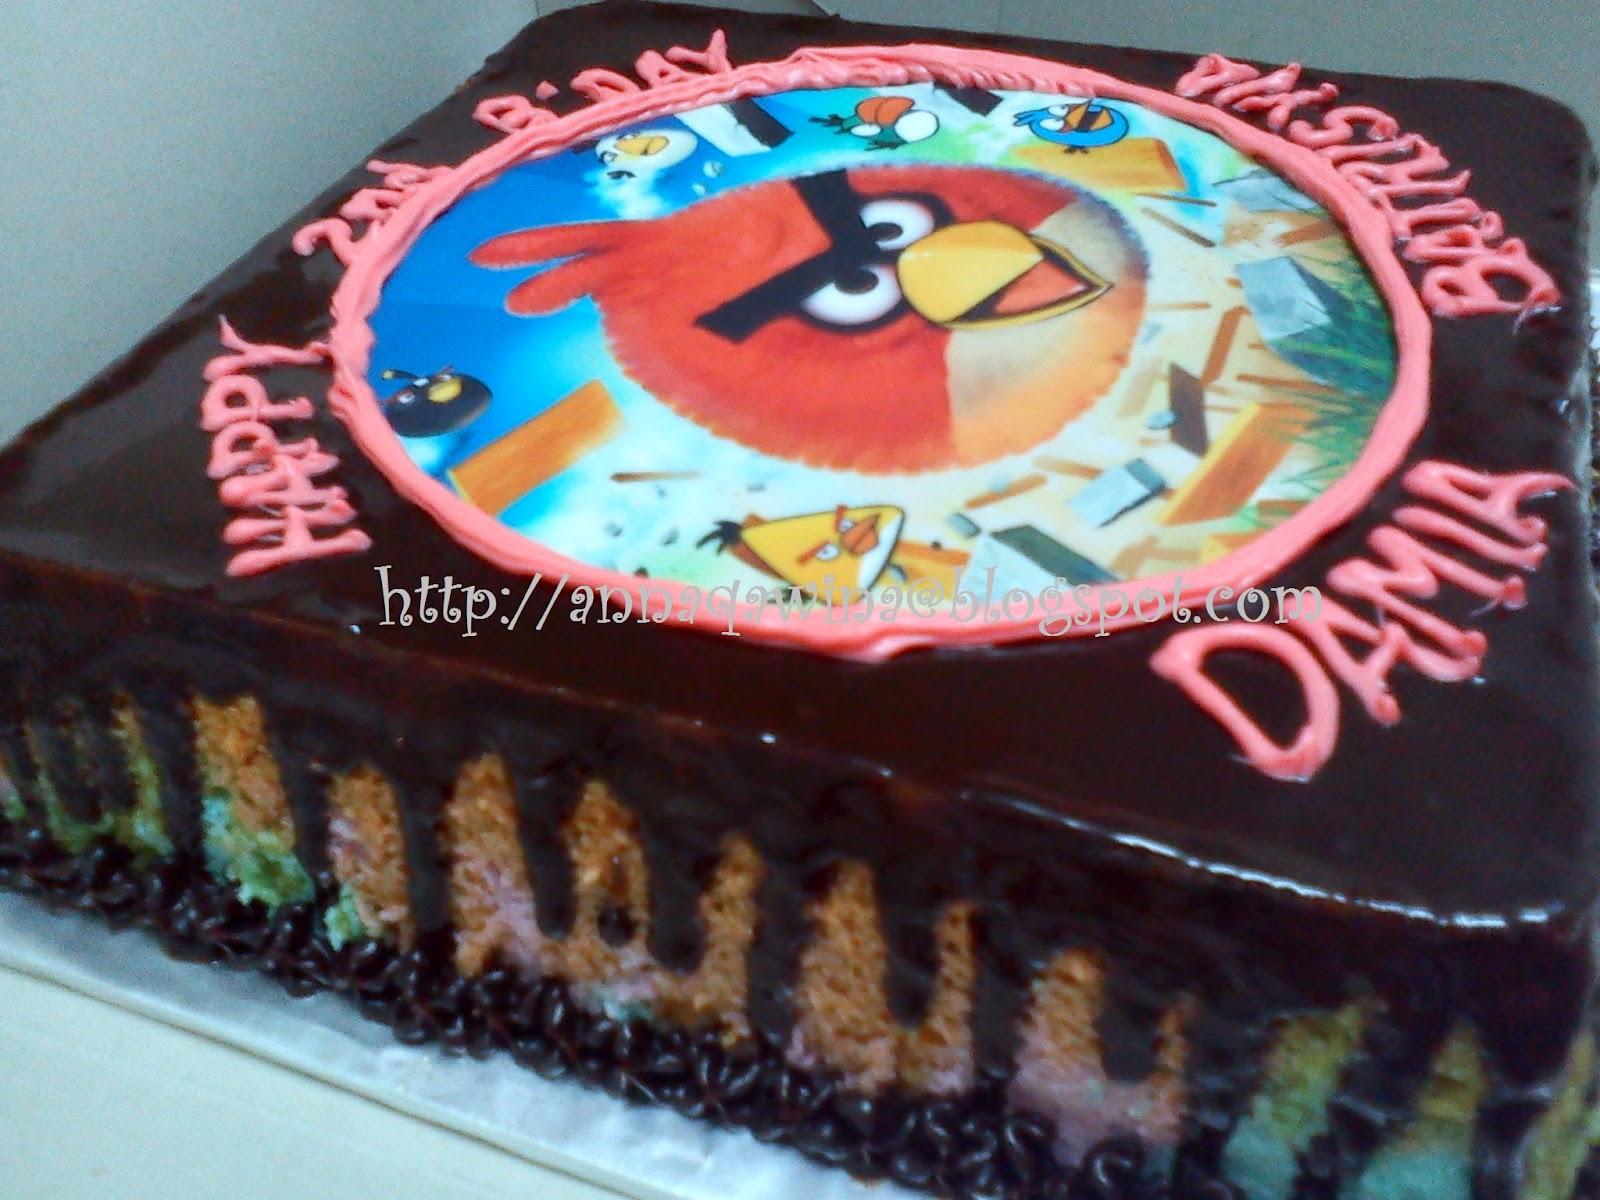 Tempahan dari Encik Fazly Ampang, kek karamel besday edible image ...